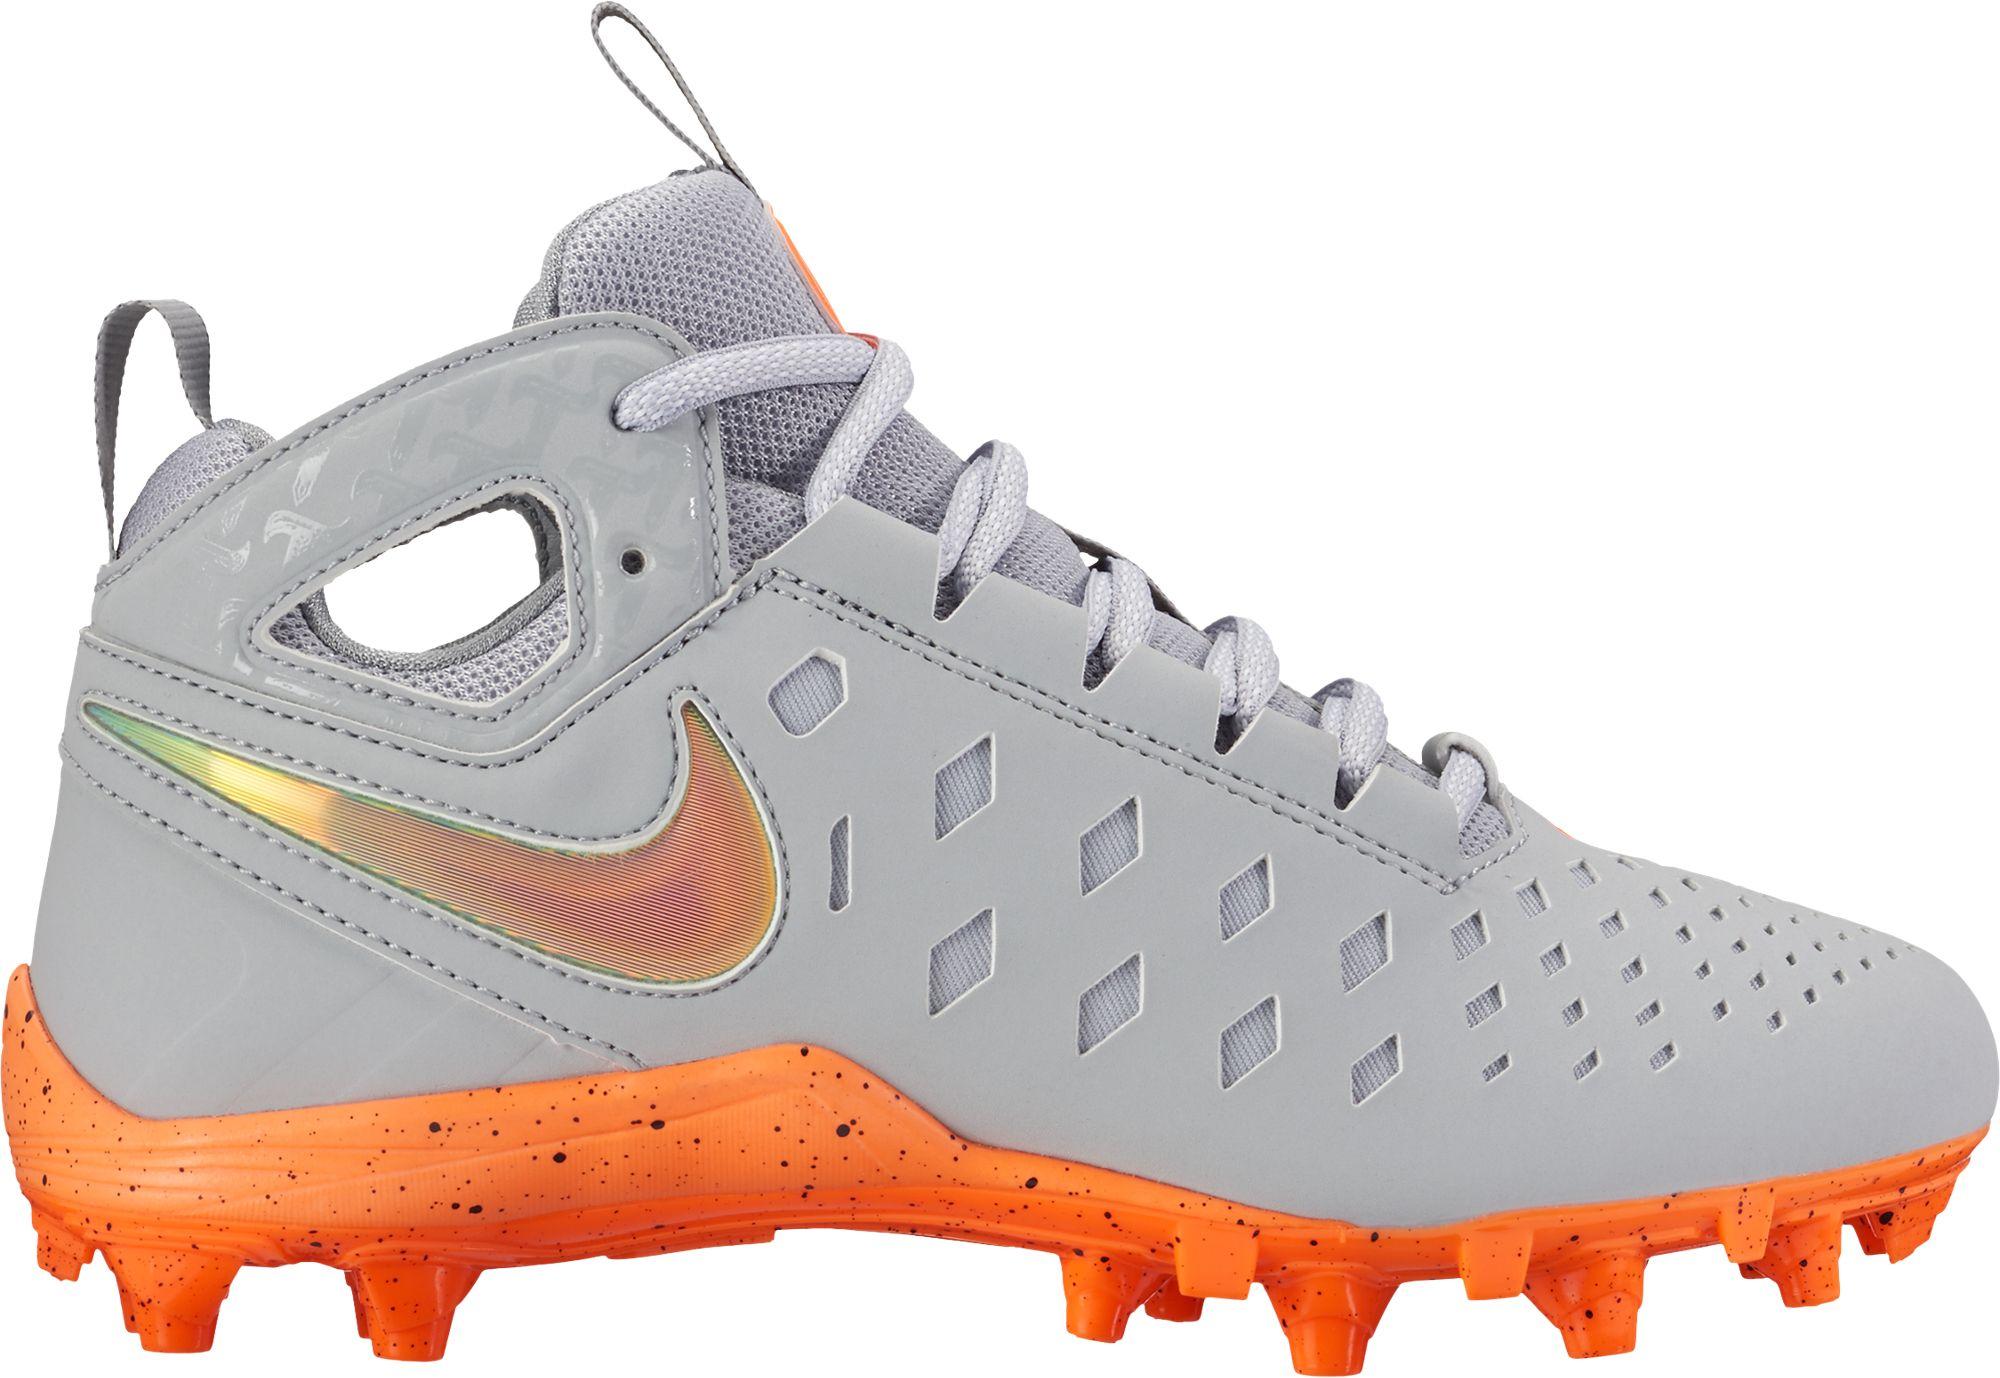 durable modeling Nike Kids Huarache V Lax LE Mid Lacrosse Cleats DICKS  Sporting Goods